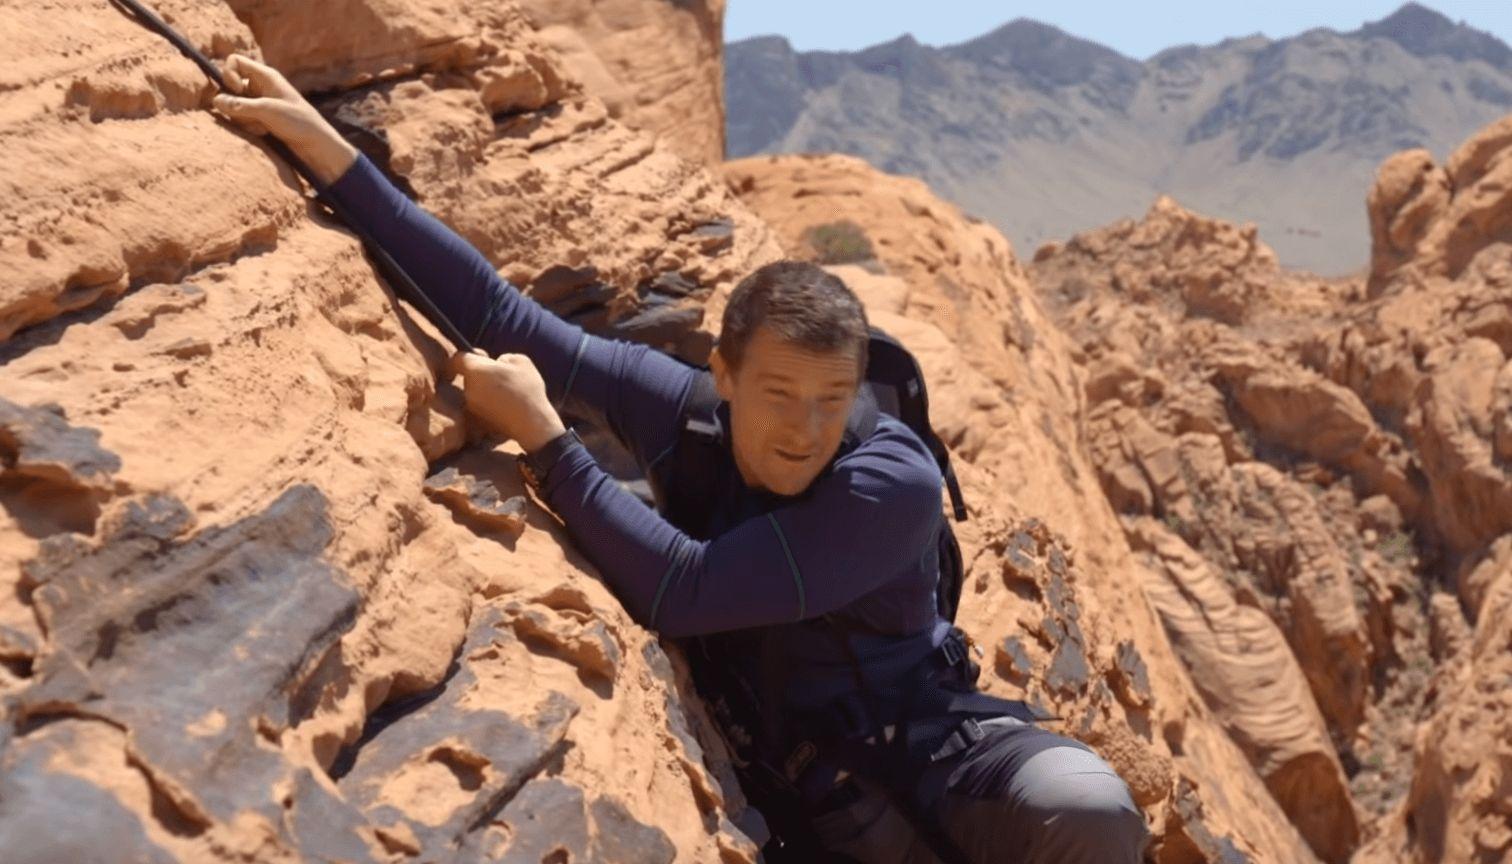 Image may contain: Bear Grylls interactive Netflix show, Bear Grylls, interactive series, Netflix, You vs Wild, Rock Climbing, Climbing, Sports, Sport, Person, Human, Outdoors